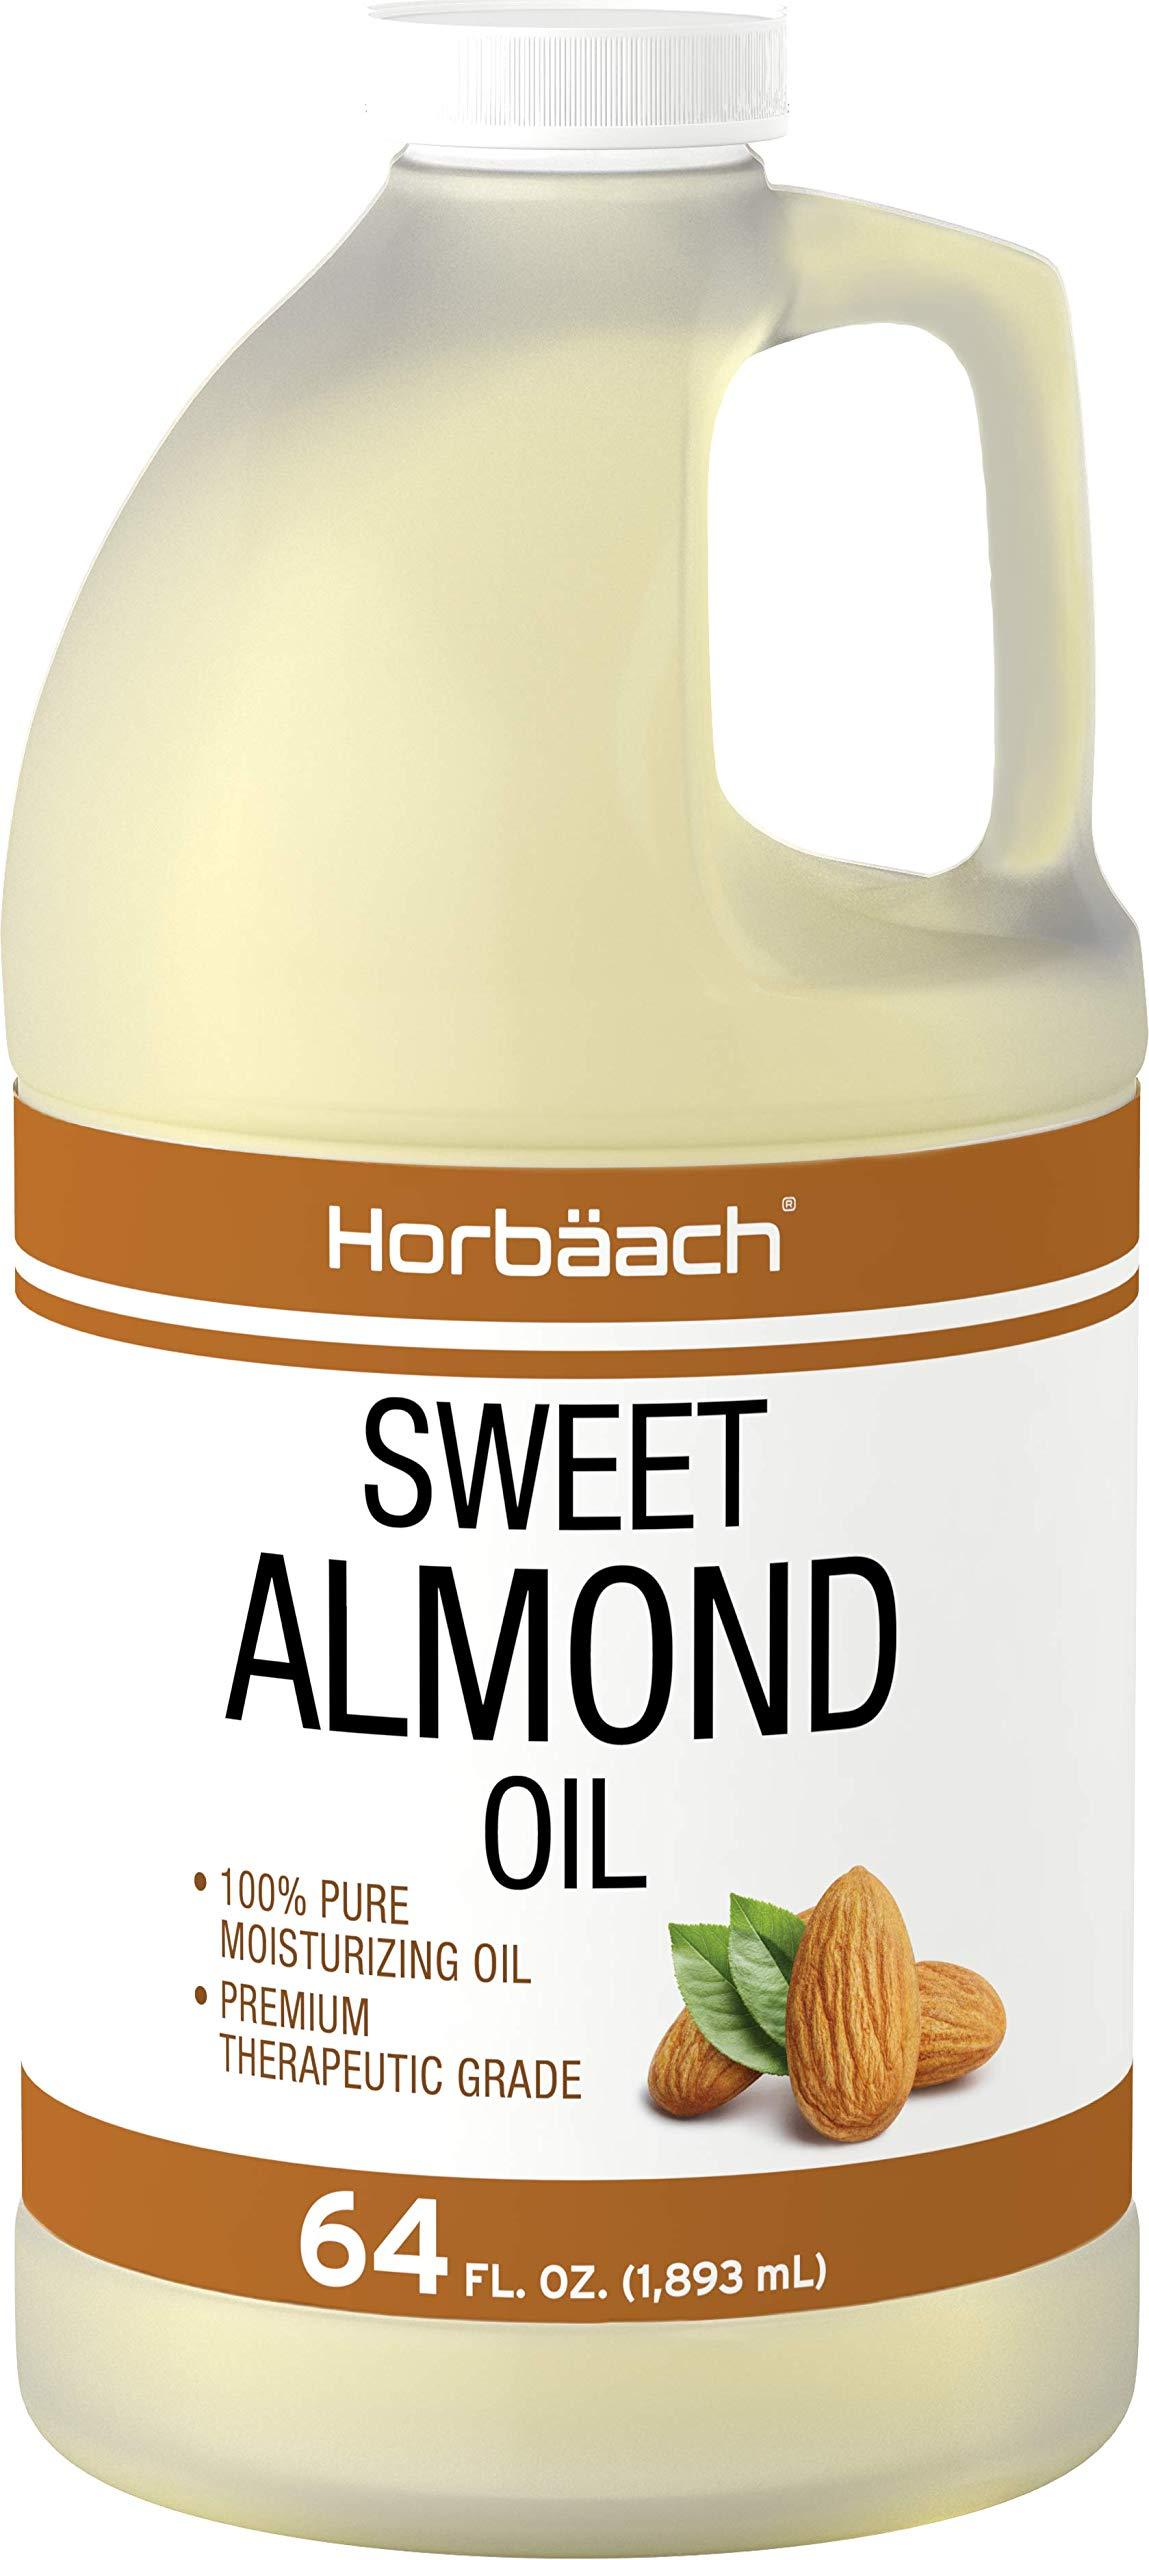 Horbaach Sweet Almond Oil 64 fl oz | Expeller Pressed | Vegetarian, Non-GMO